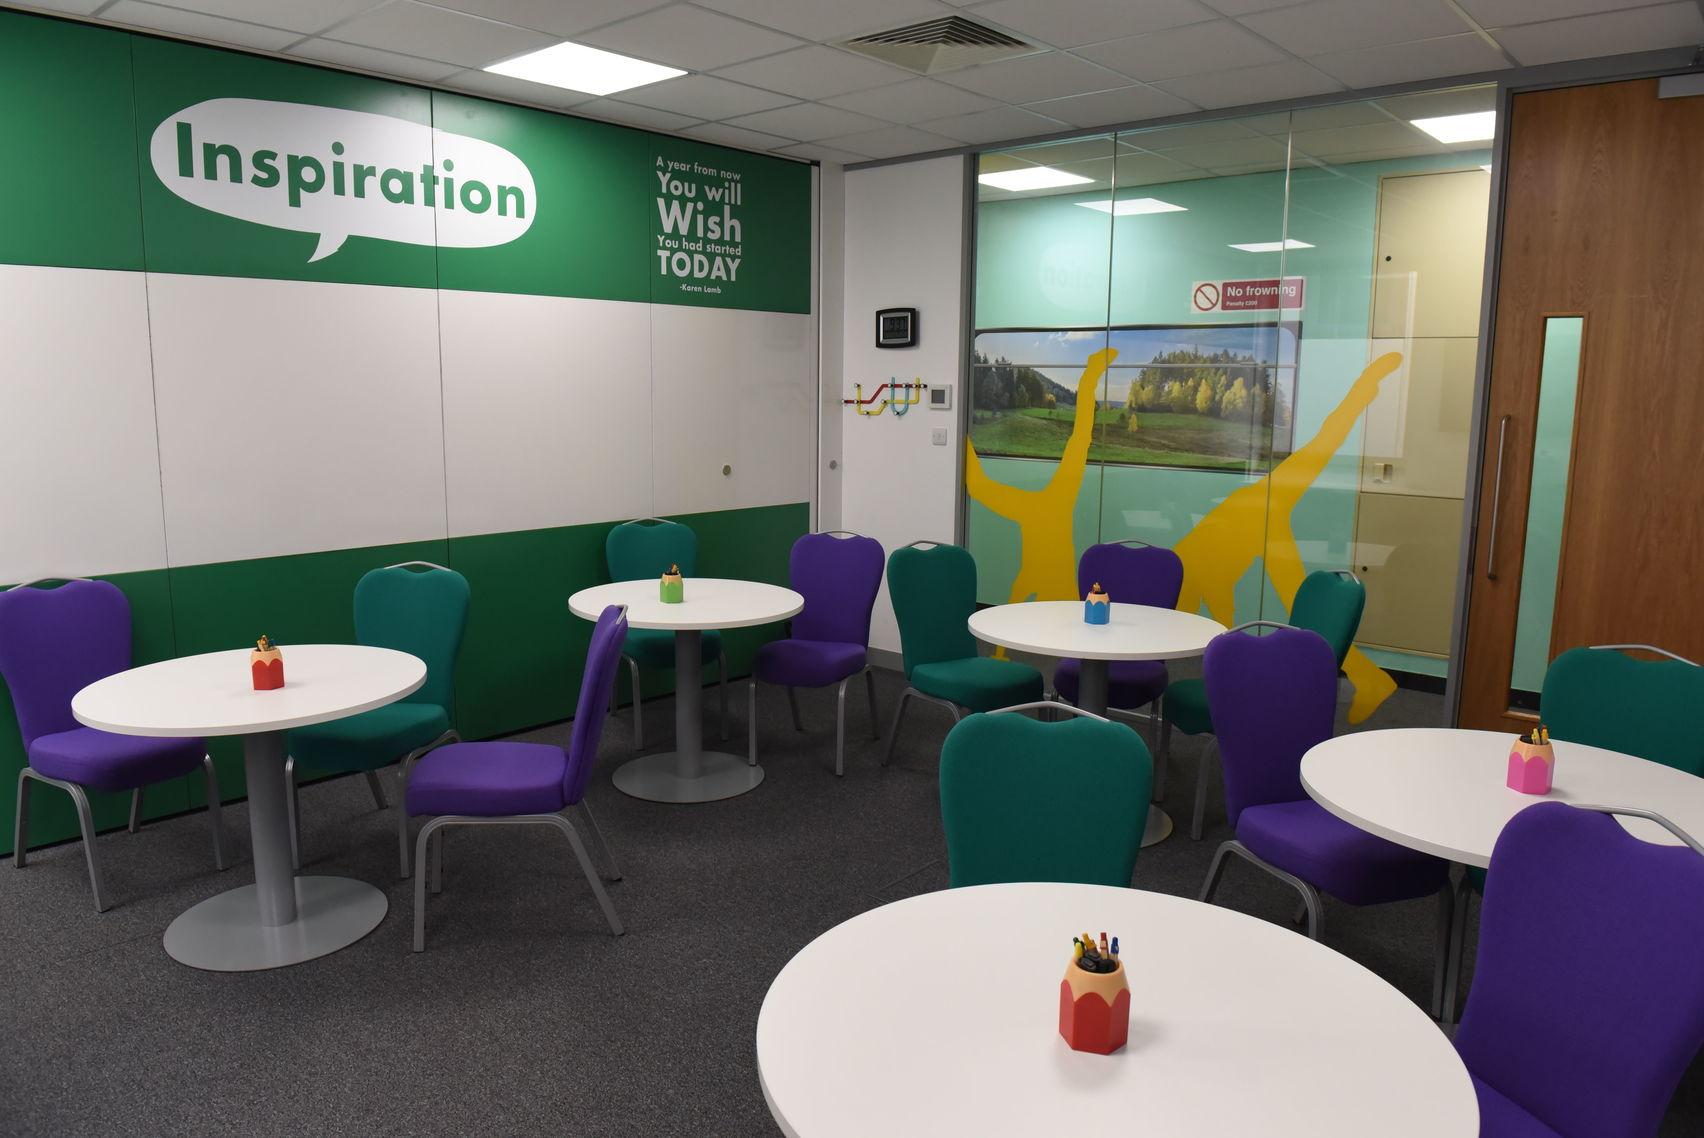 Room 2, Inspiration, Happy Computers Ltd